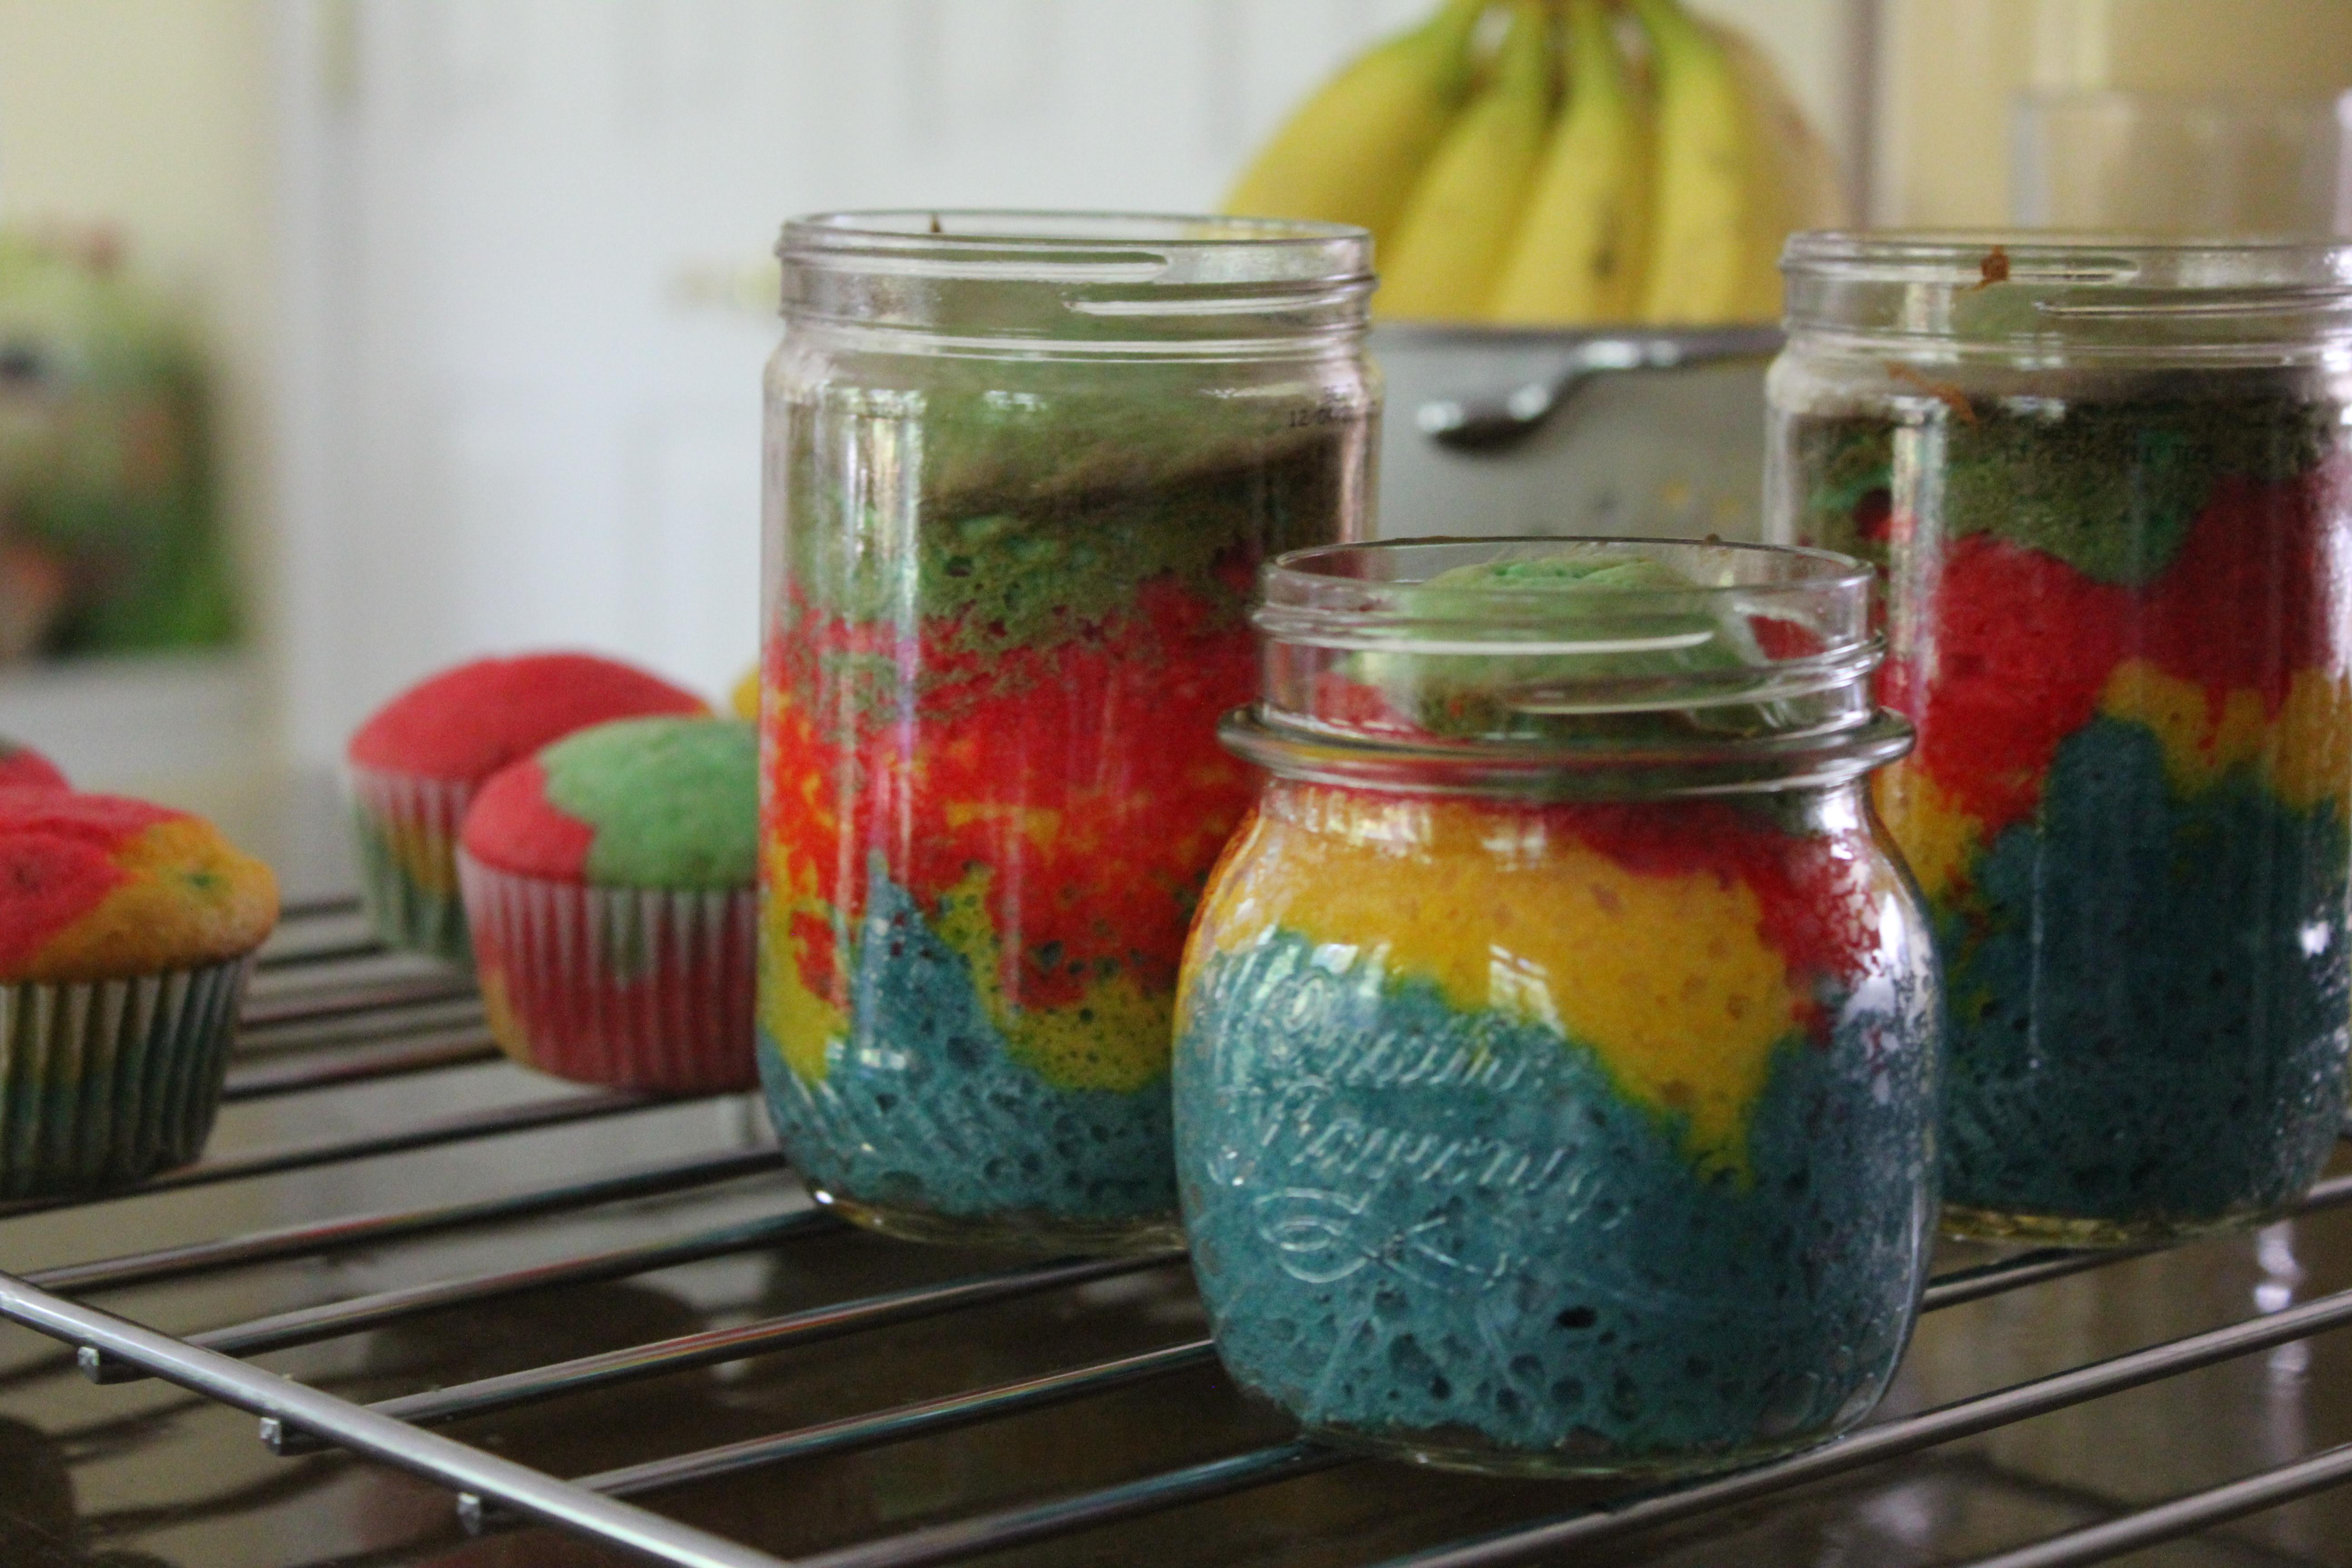 Resep Cake In Jar Rainbow: RESEP RAINBOW CAKE KUKUS NY LIEM